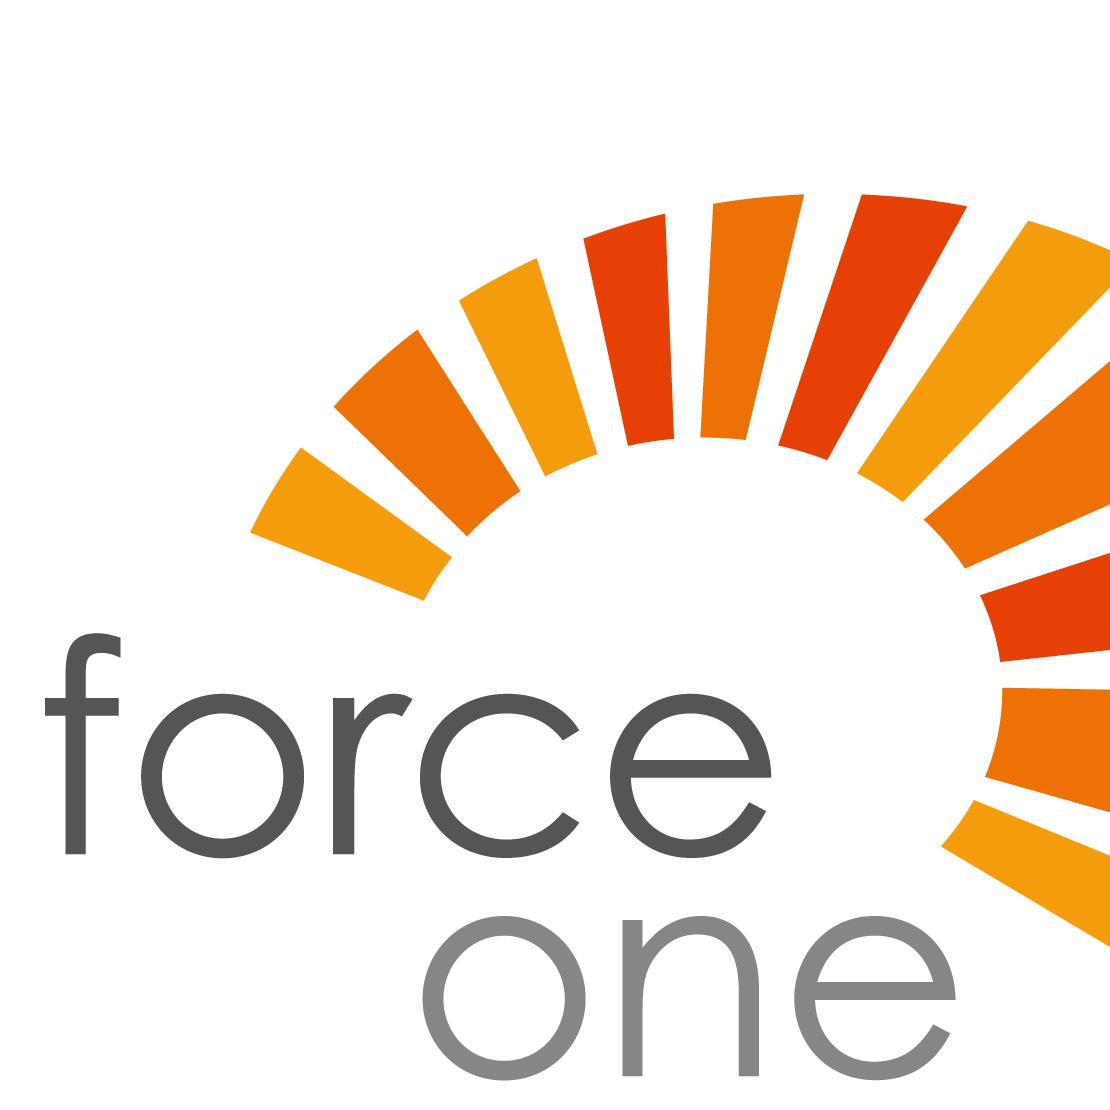 7_sunforceone-logo